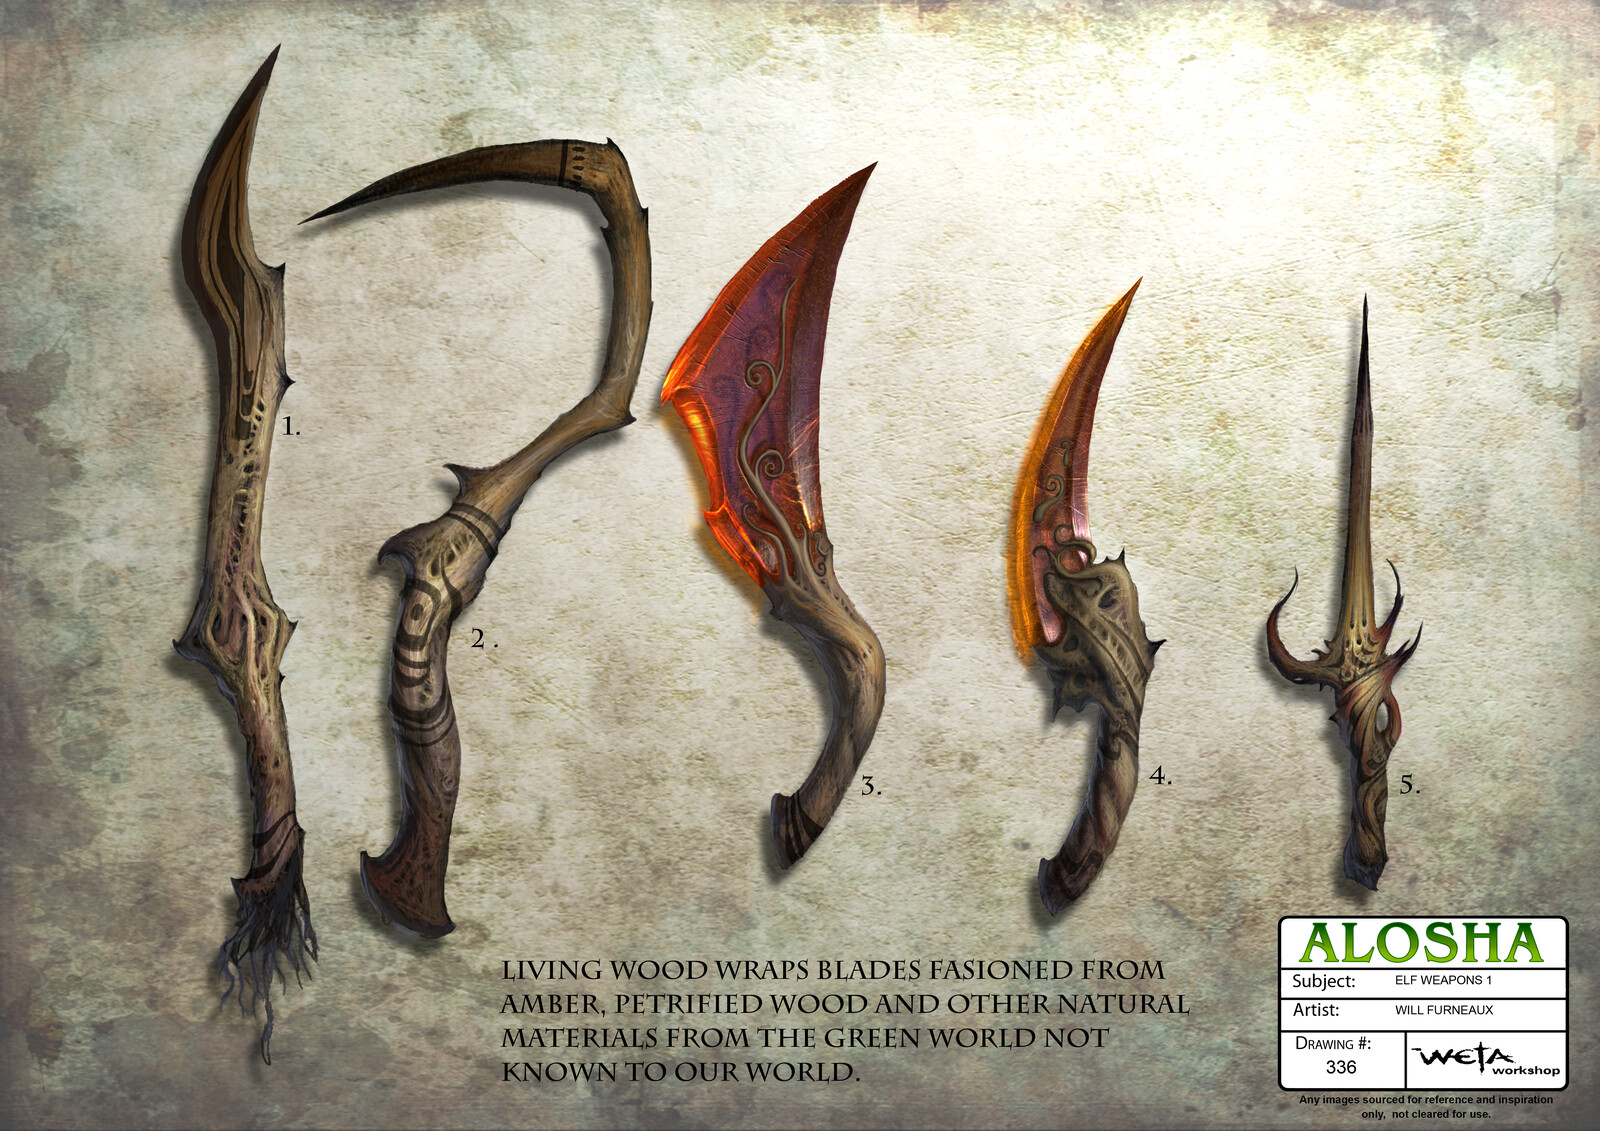 Alosha - Elf Weapons